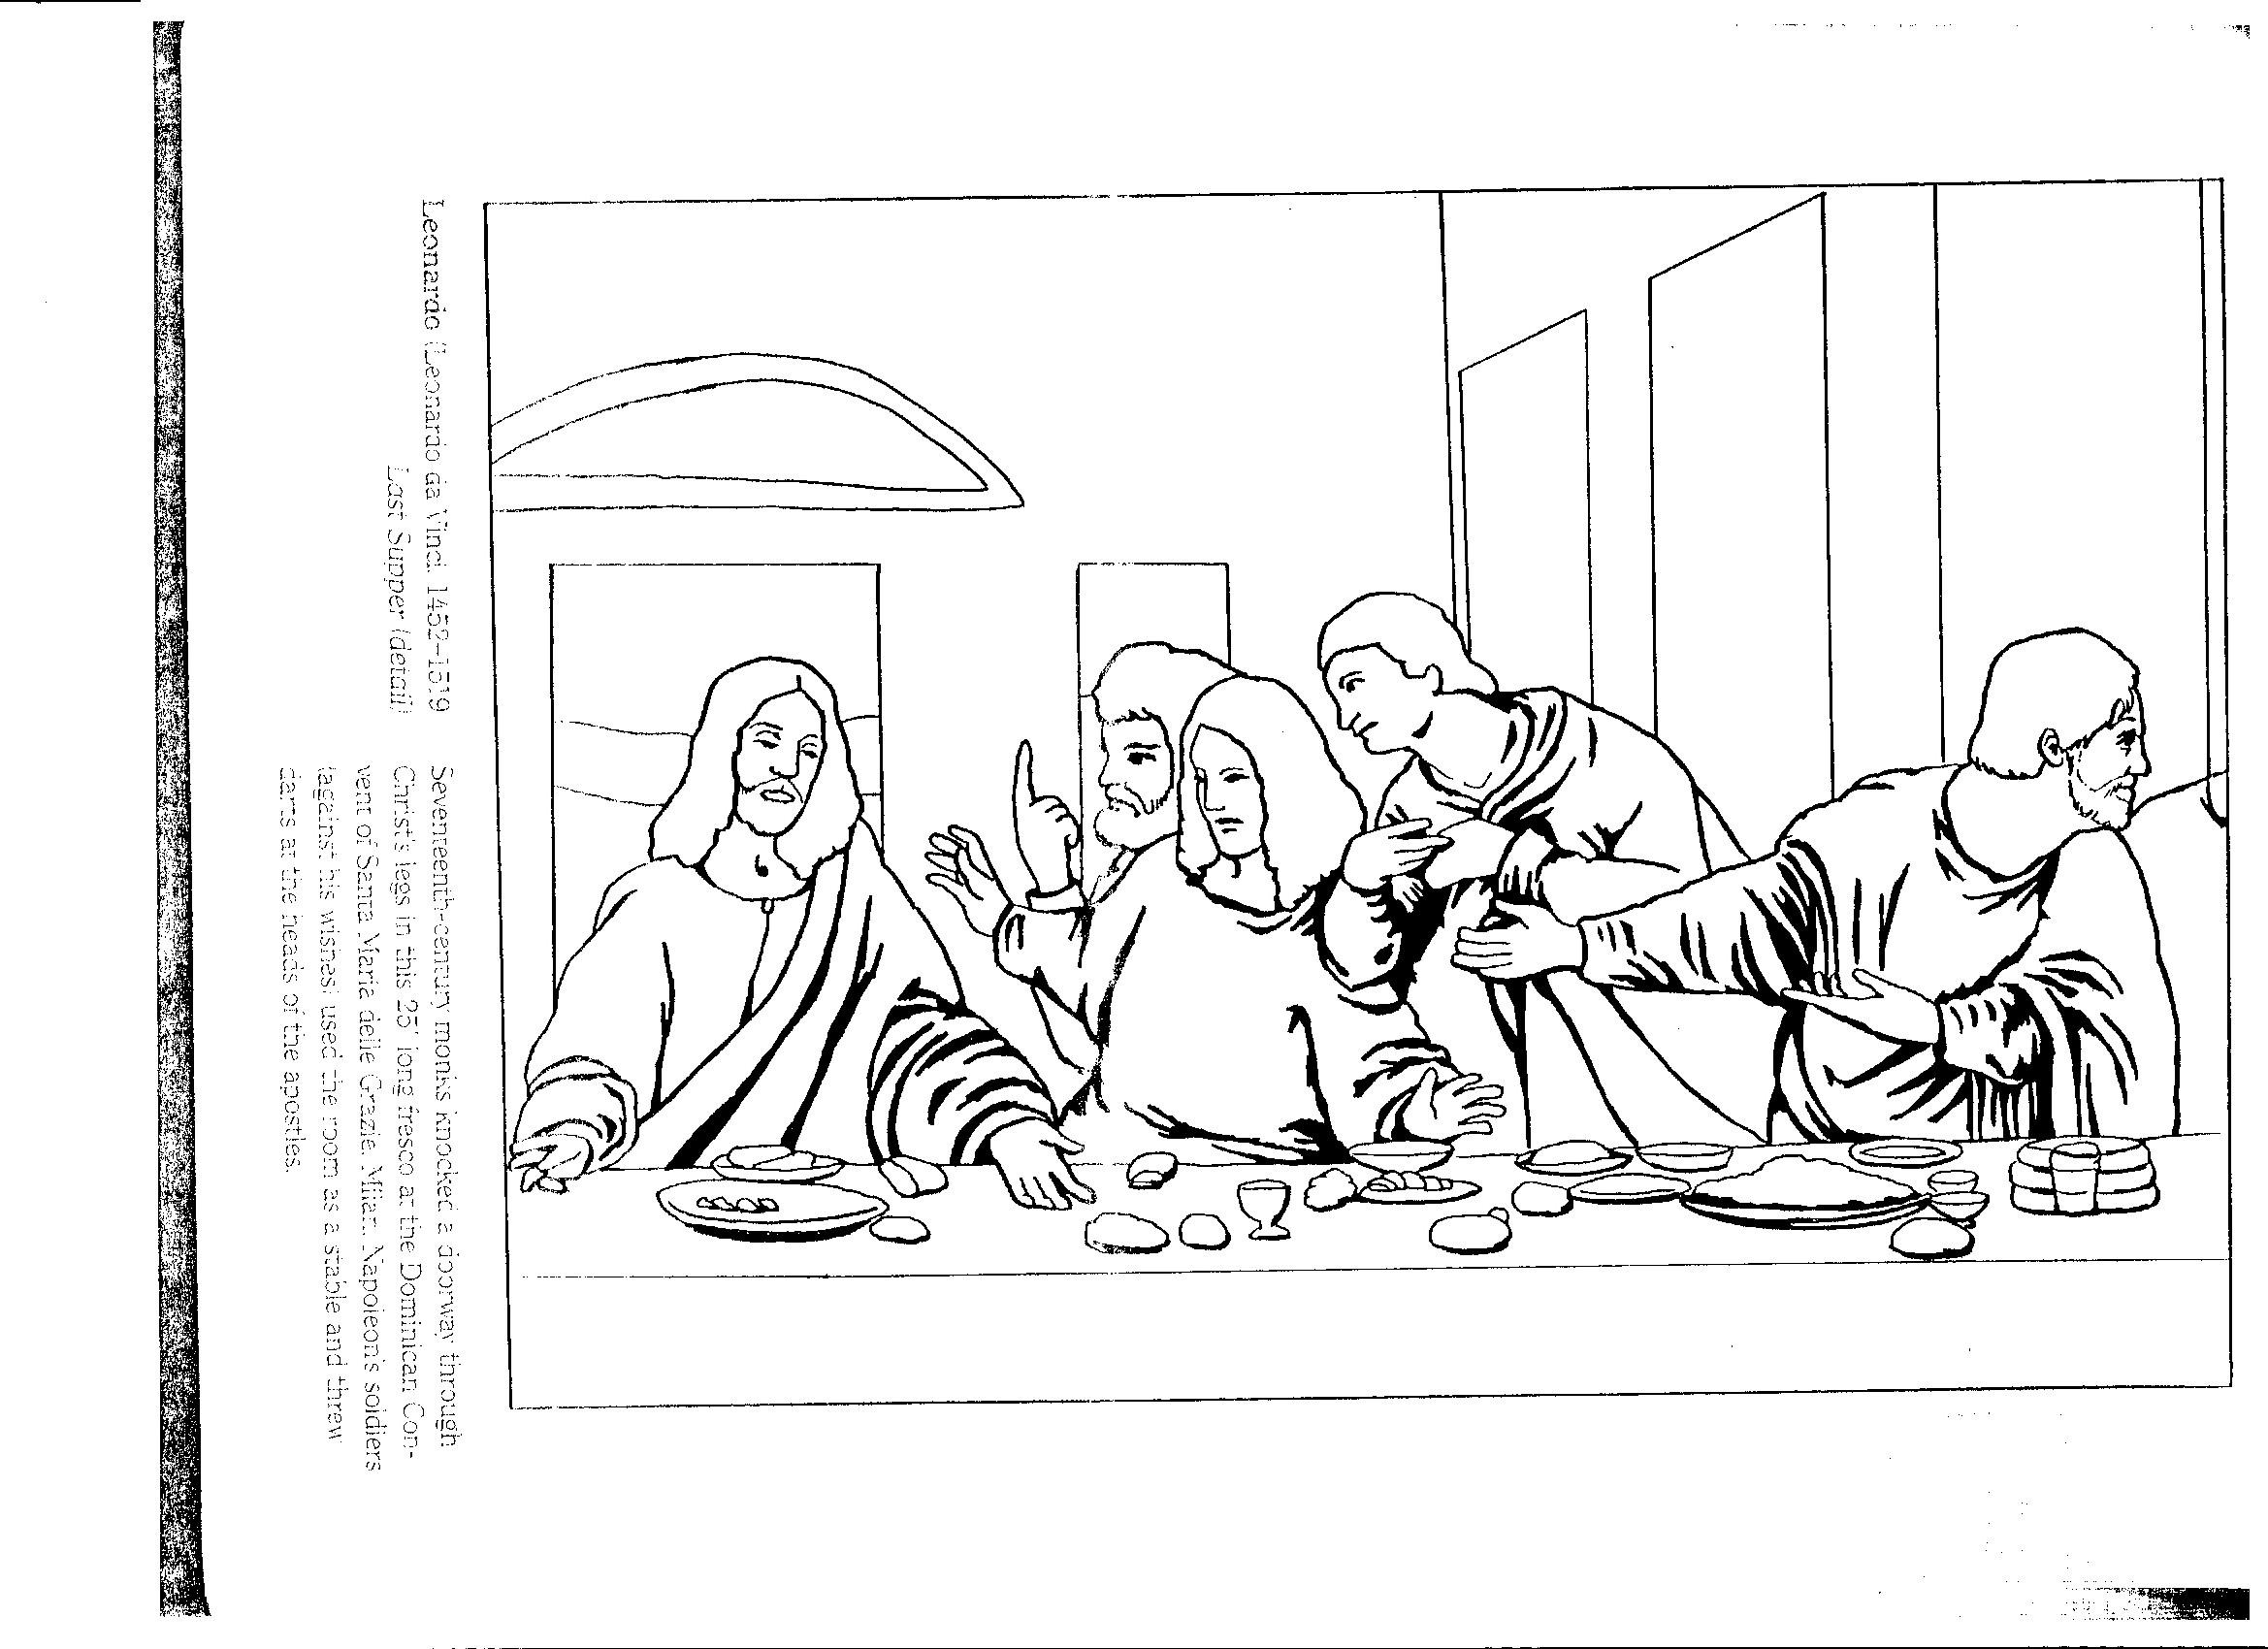 Leonardo Da Vinci The Last Supper Coloring Page Renaissance Art Coloring Pages Tingameday